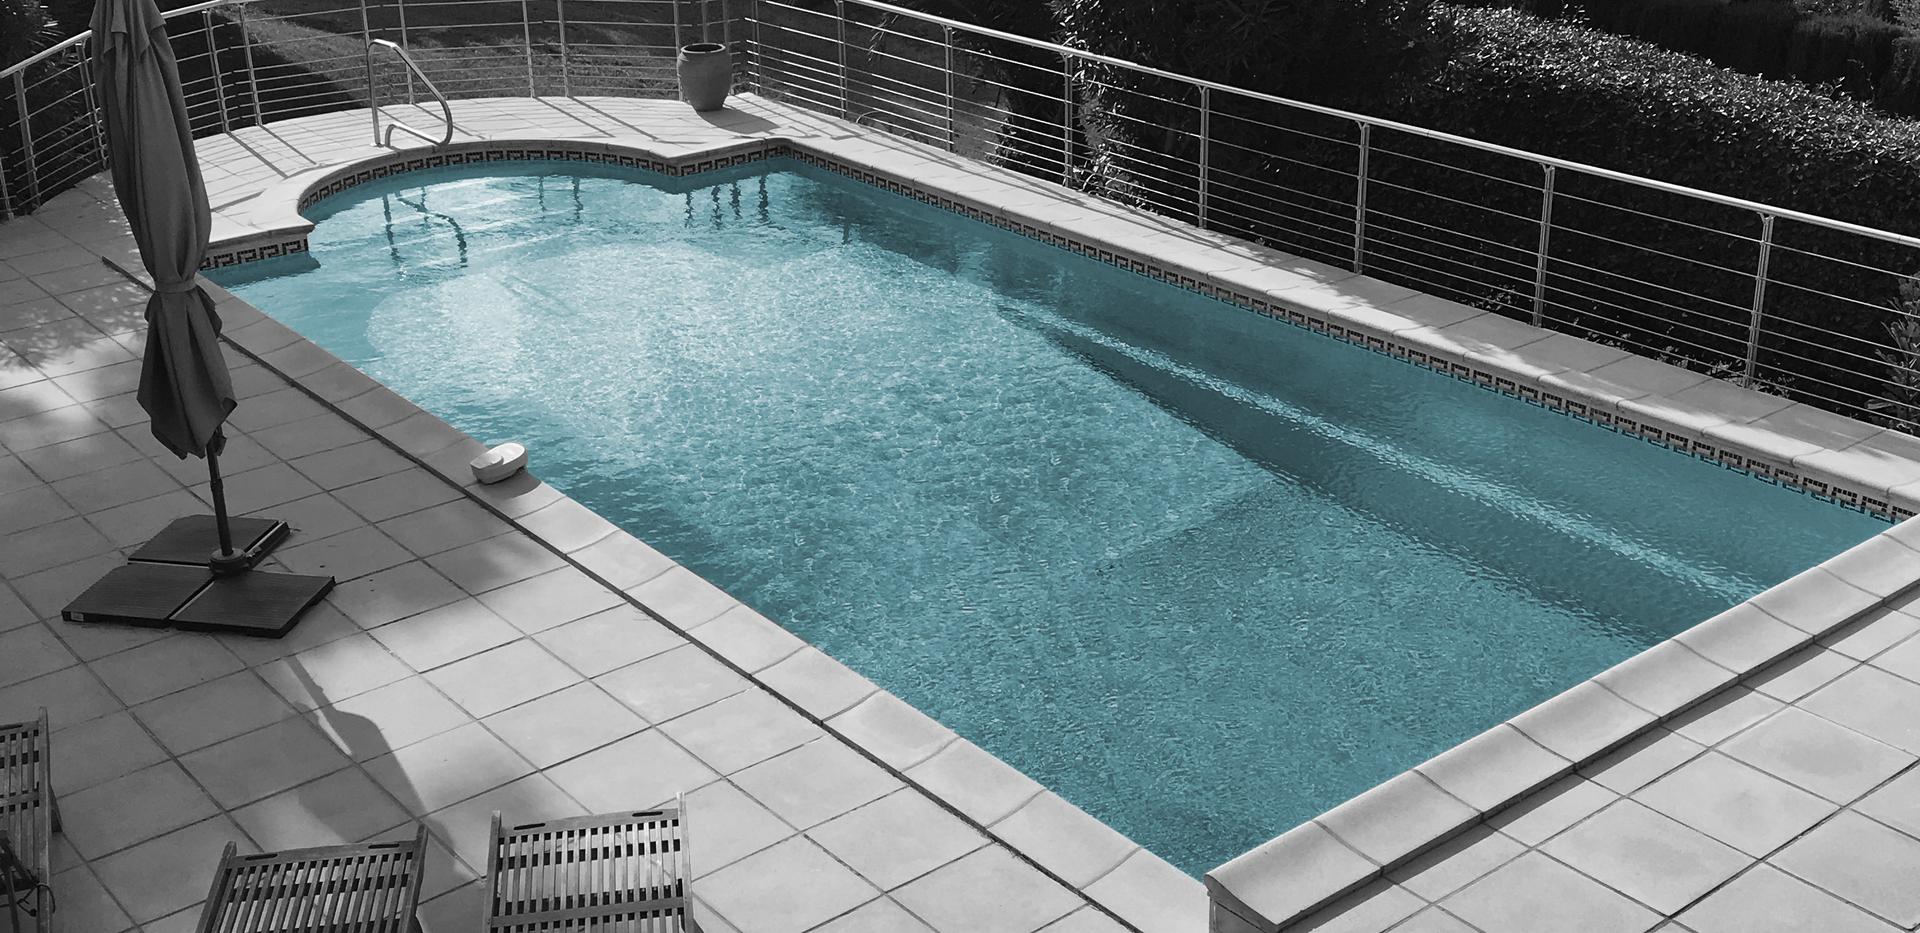 Rambarde de piscine en aluminium